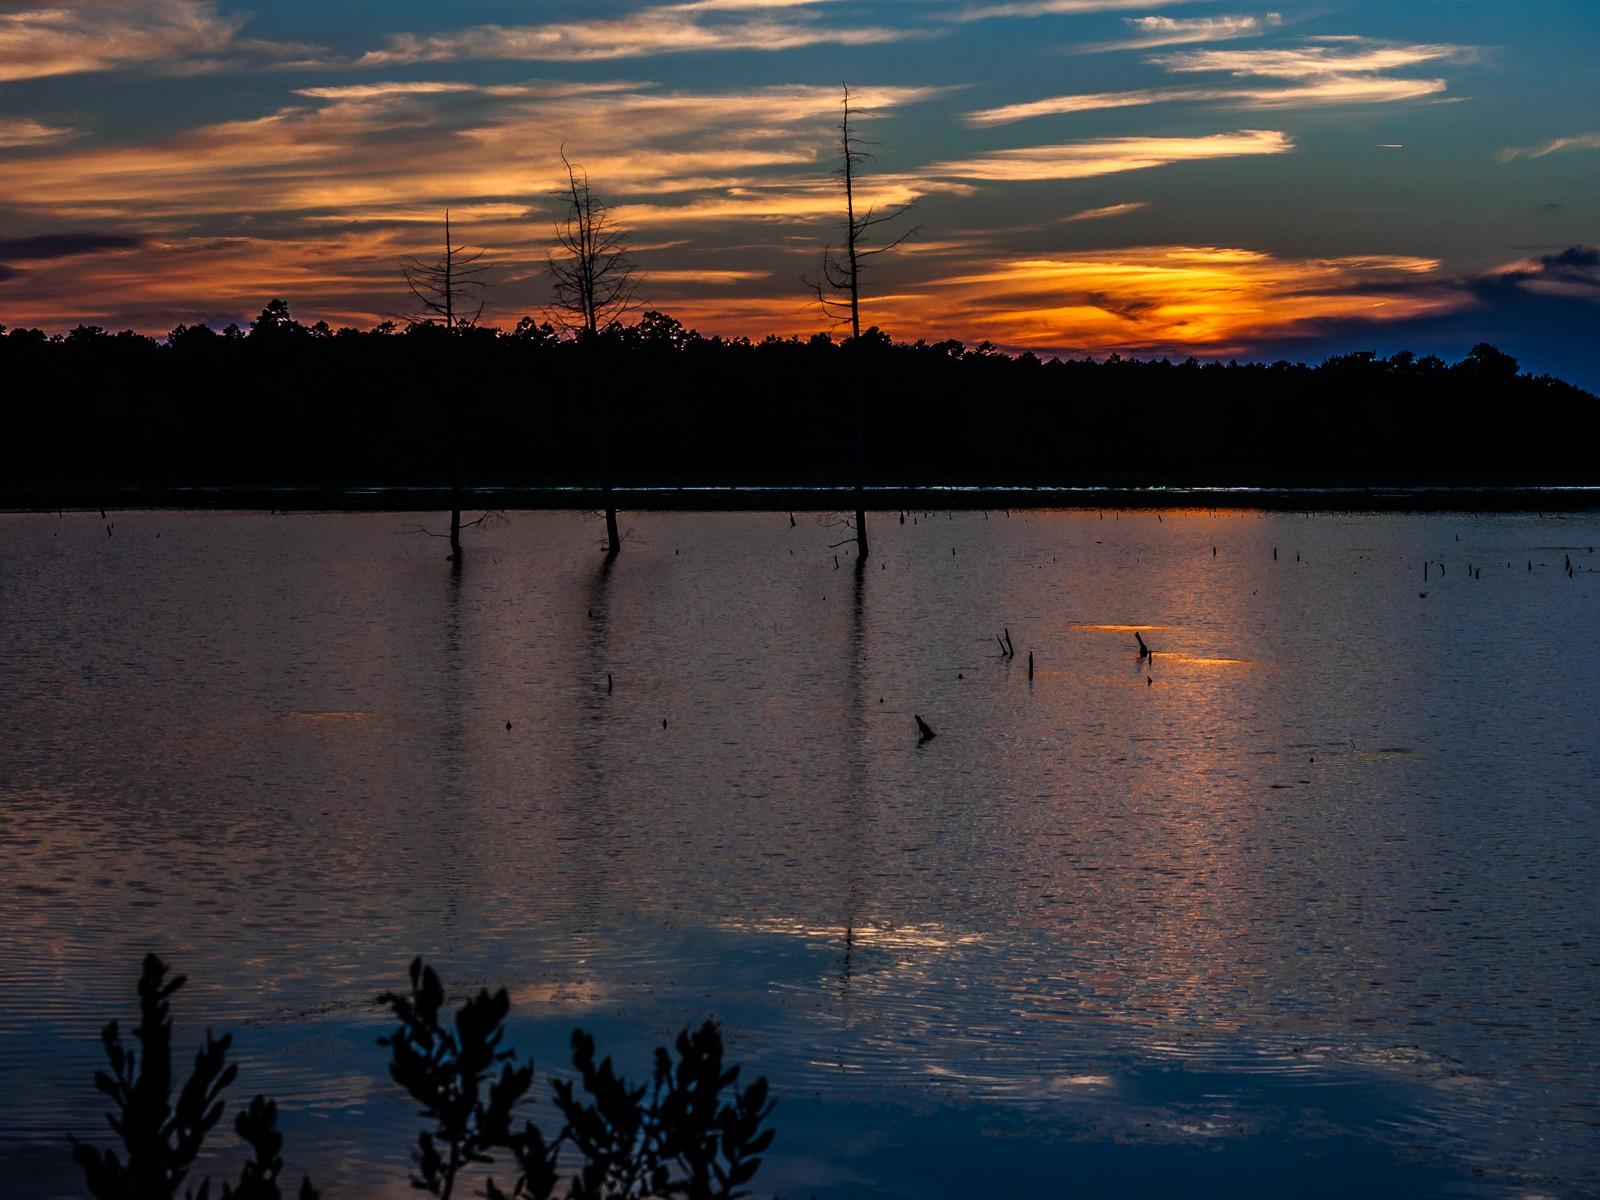 sunset-6640